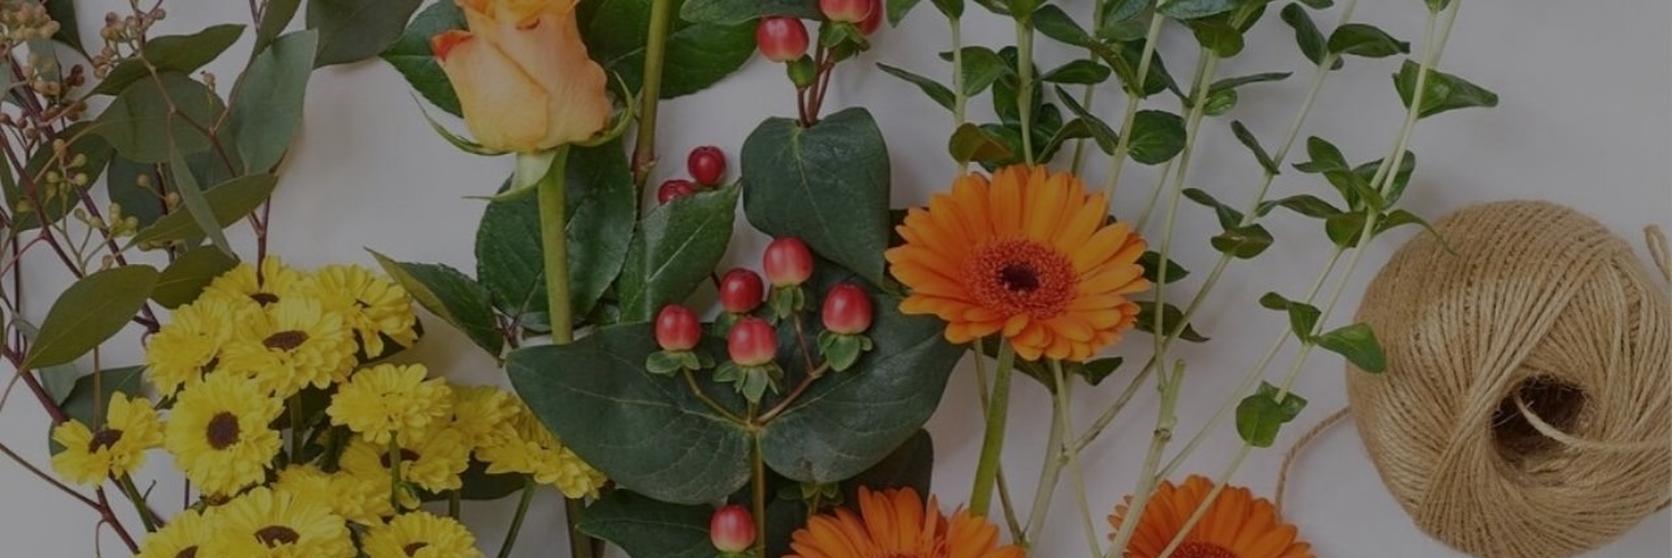 Fall-for-autumn-colours-2-1